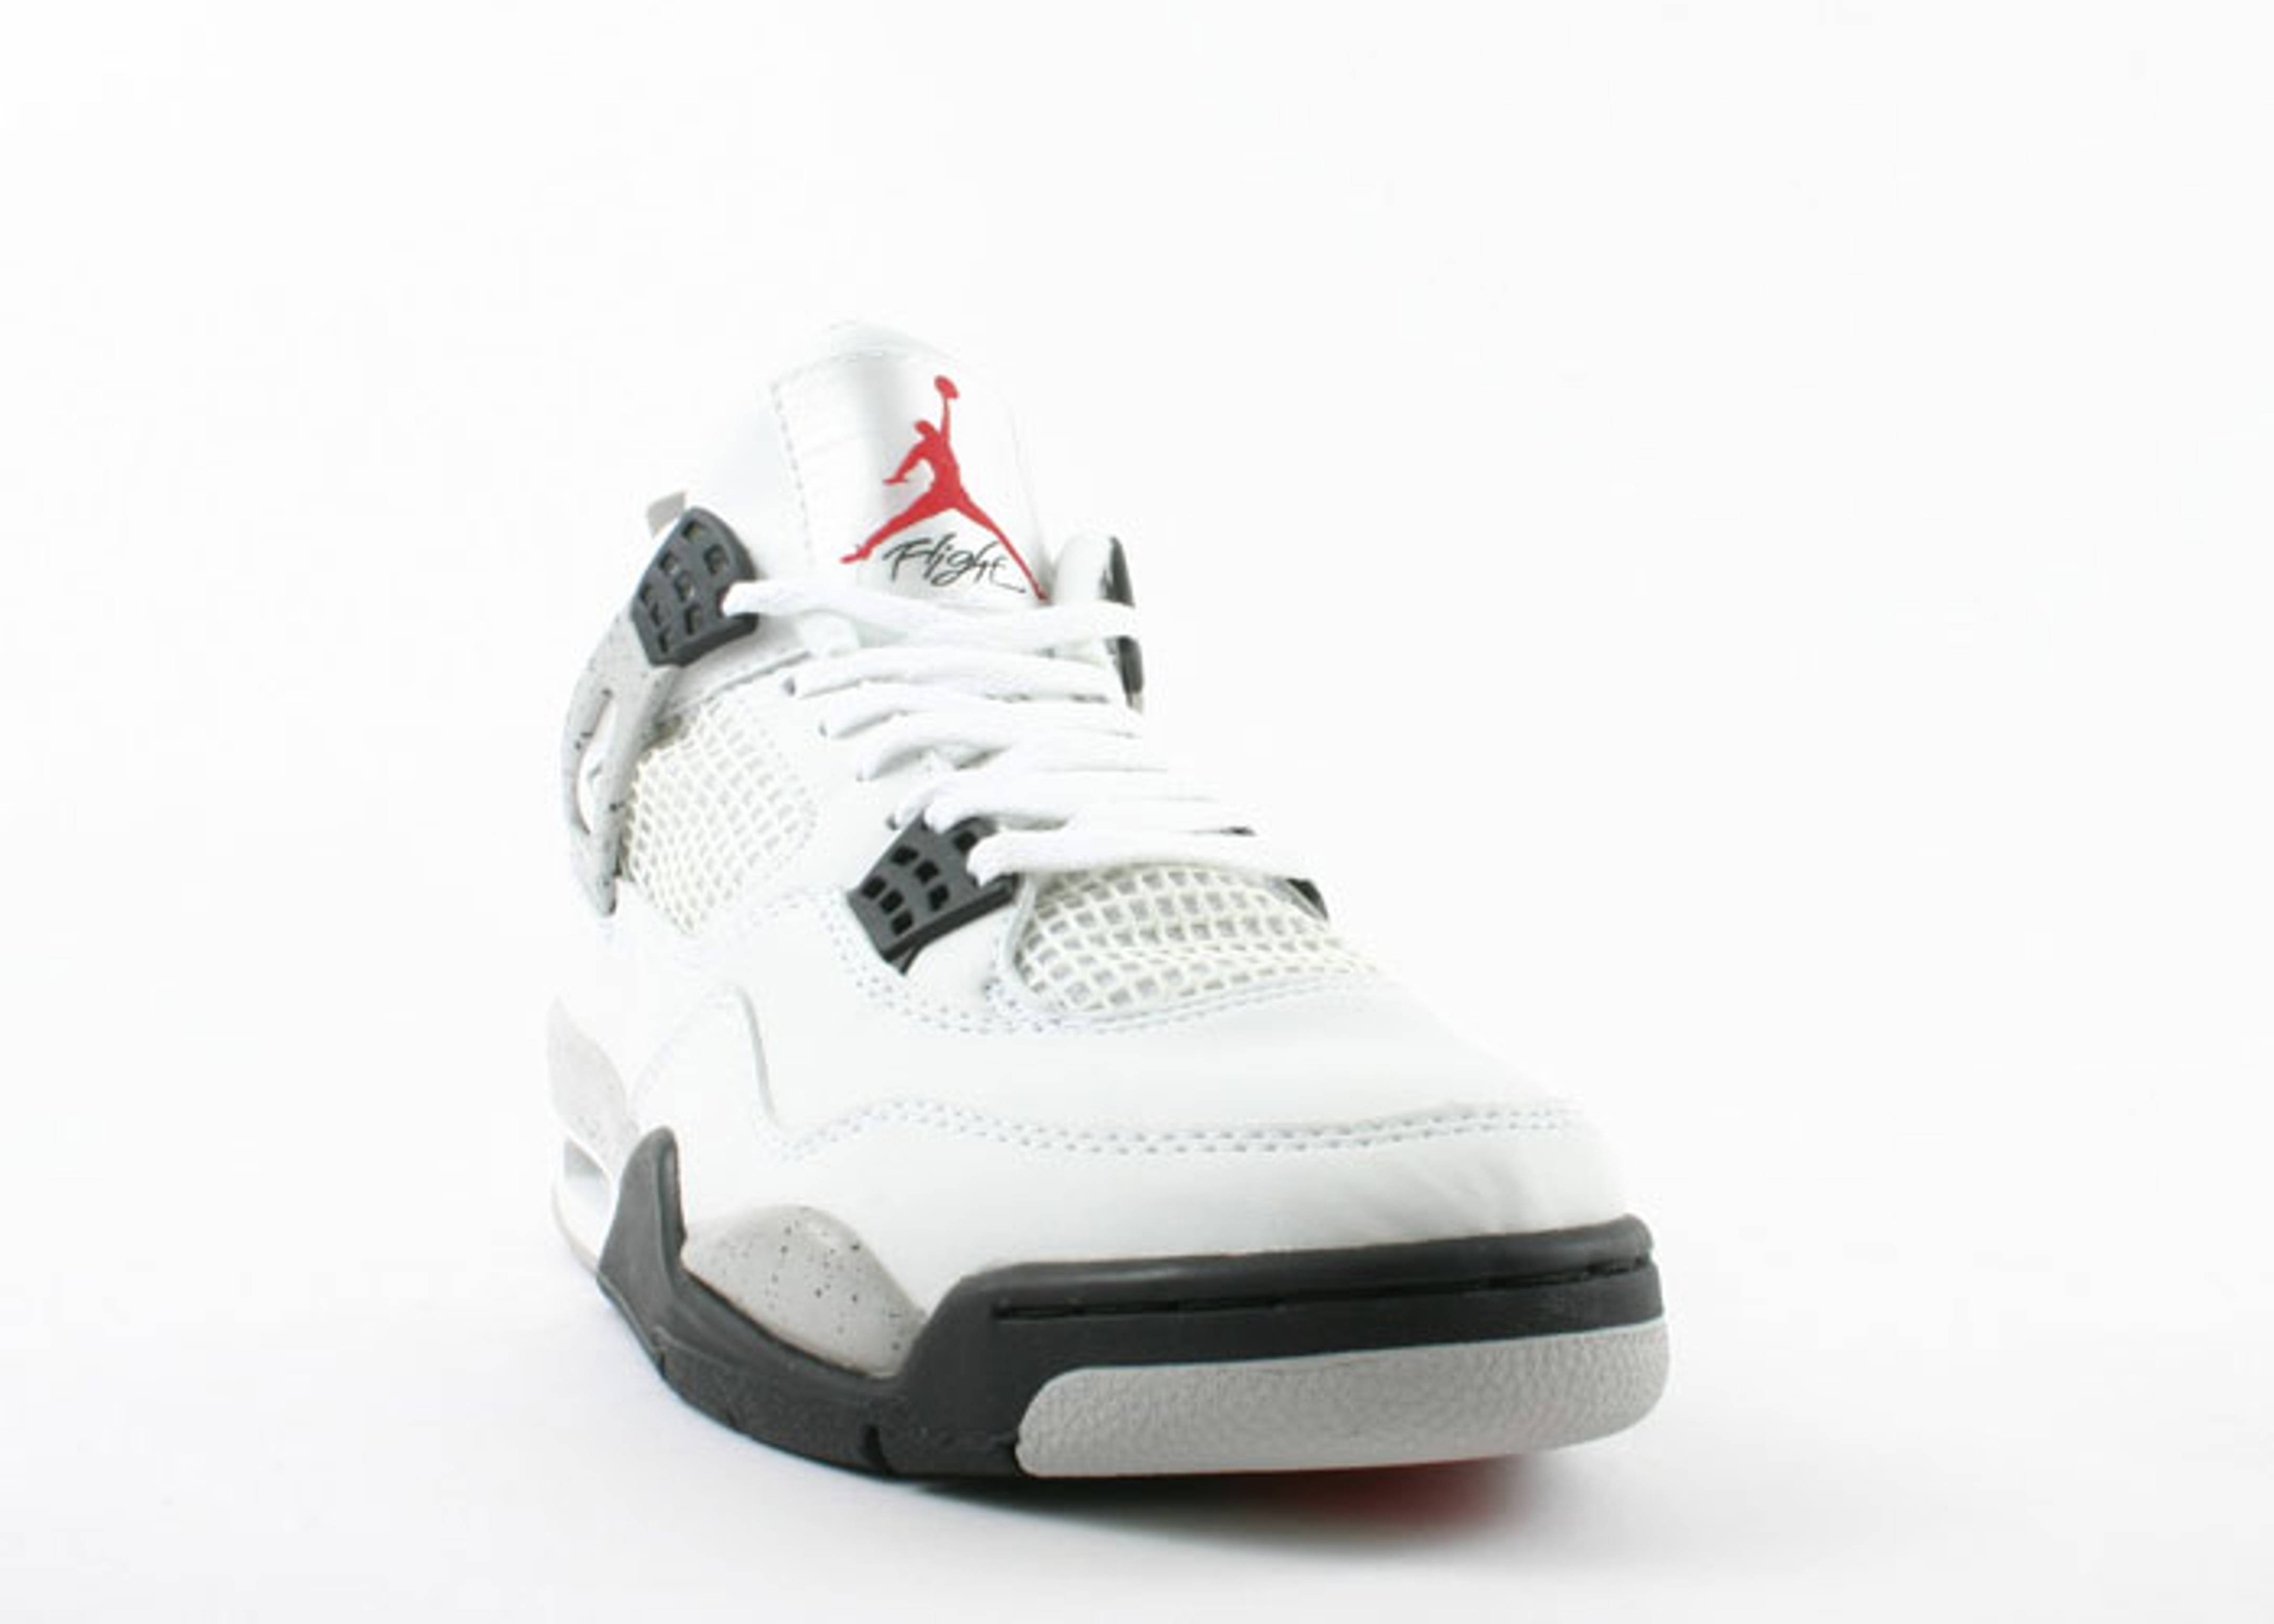 Air Jordan 4 Retro 'Cement' 1999